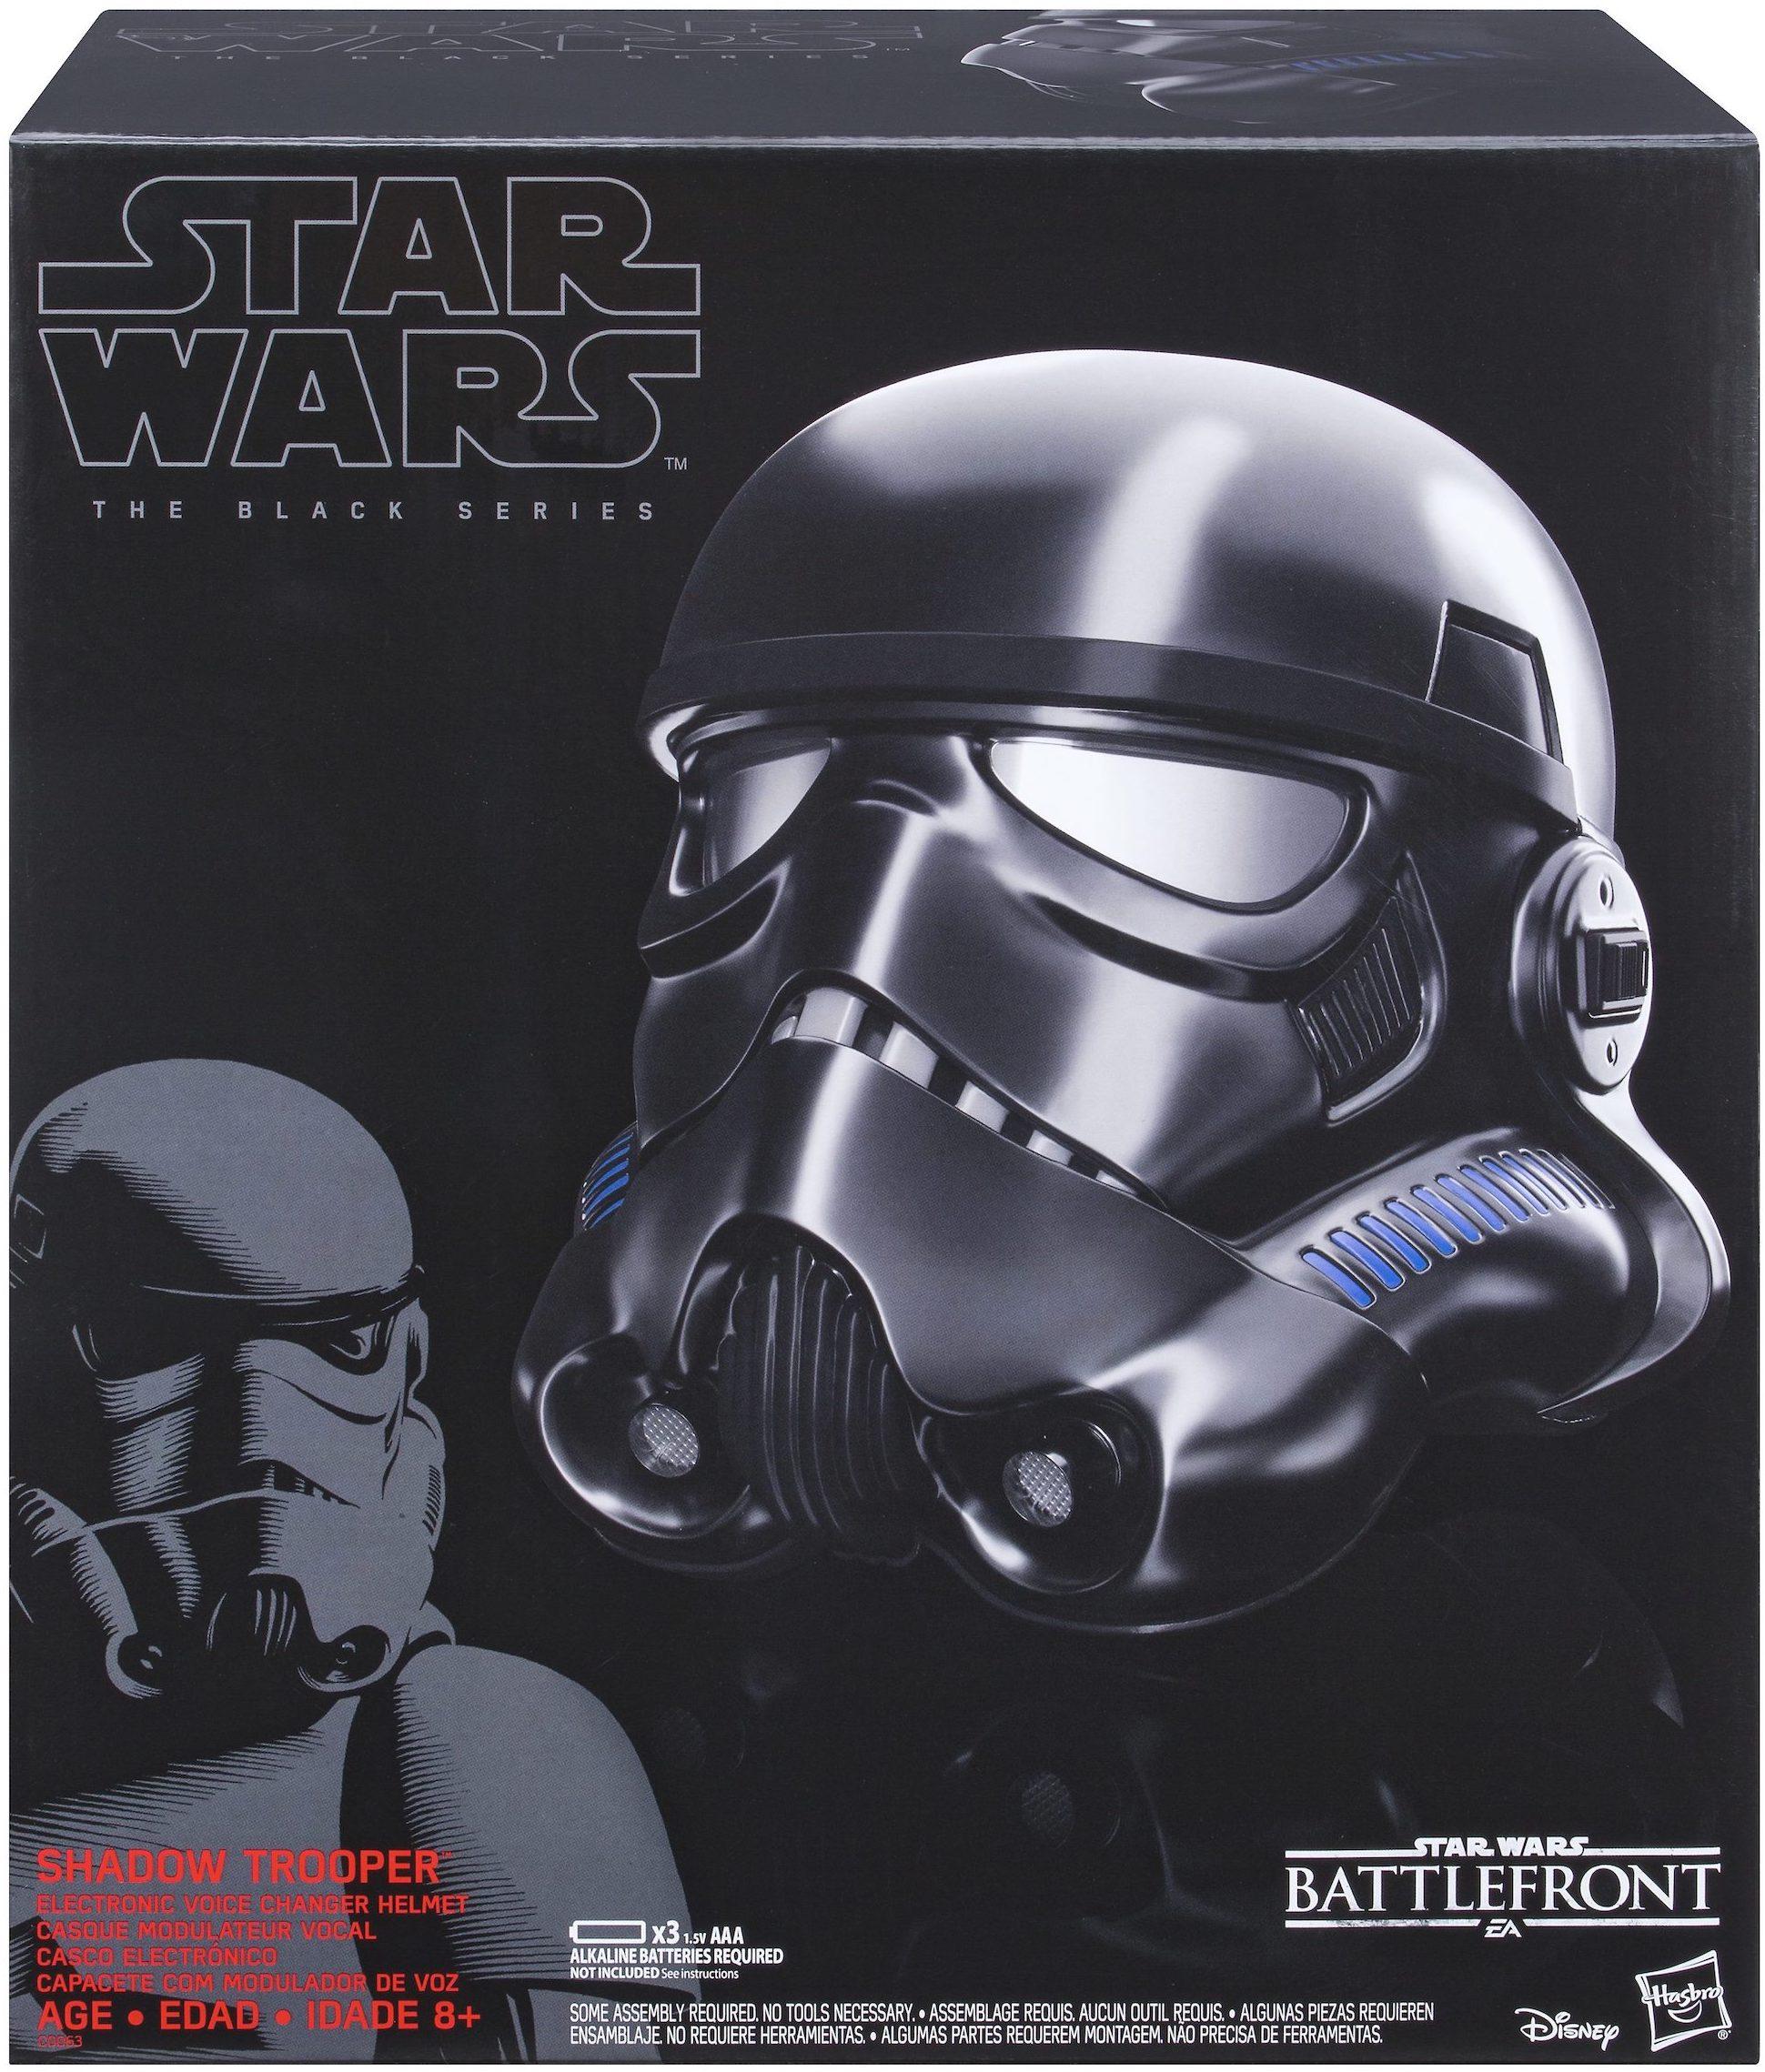 Star Wars Black Series Visual Guide